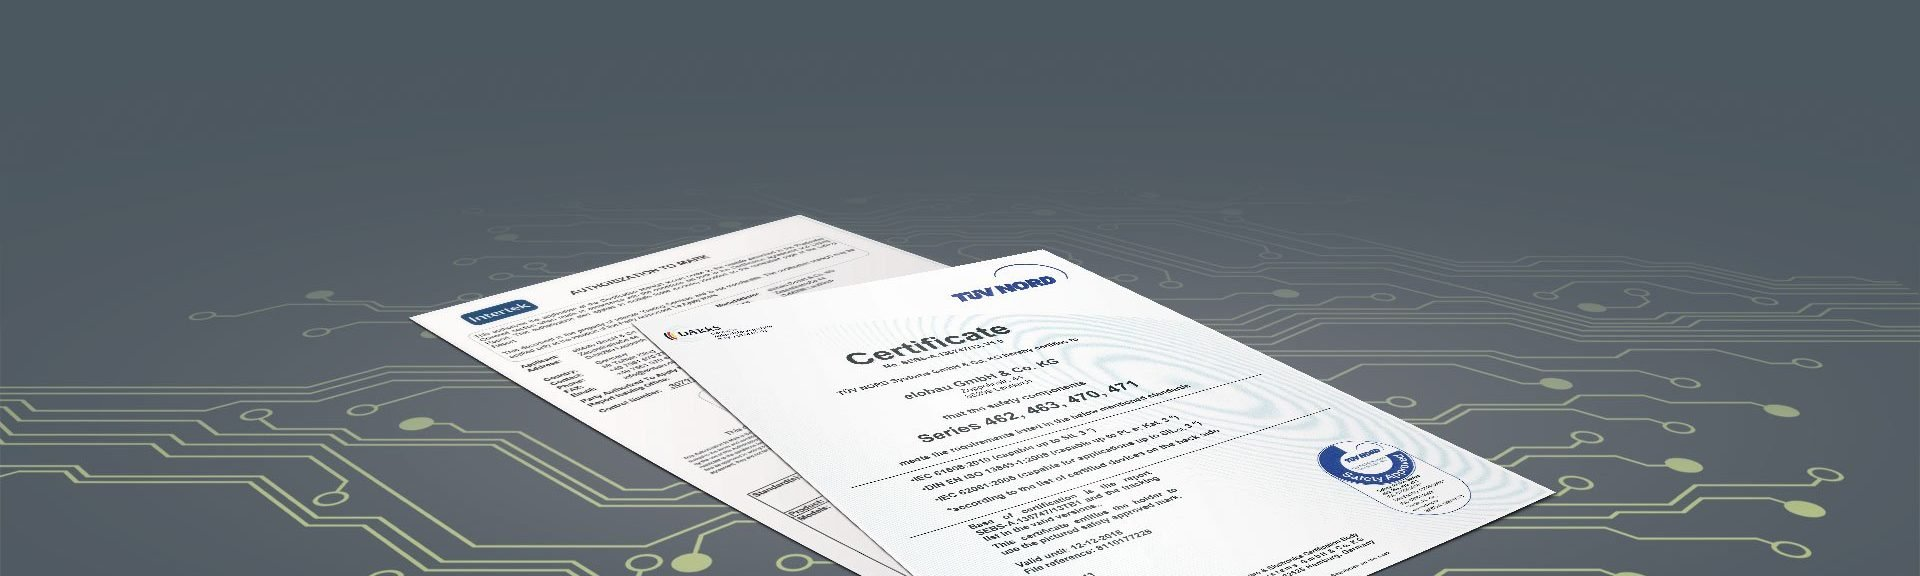 Zertifikate-BE-1920×1080-RZ-06022018